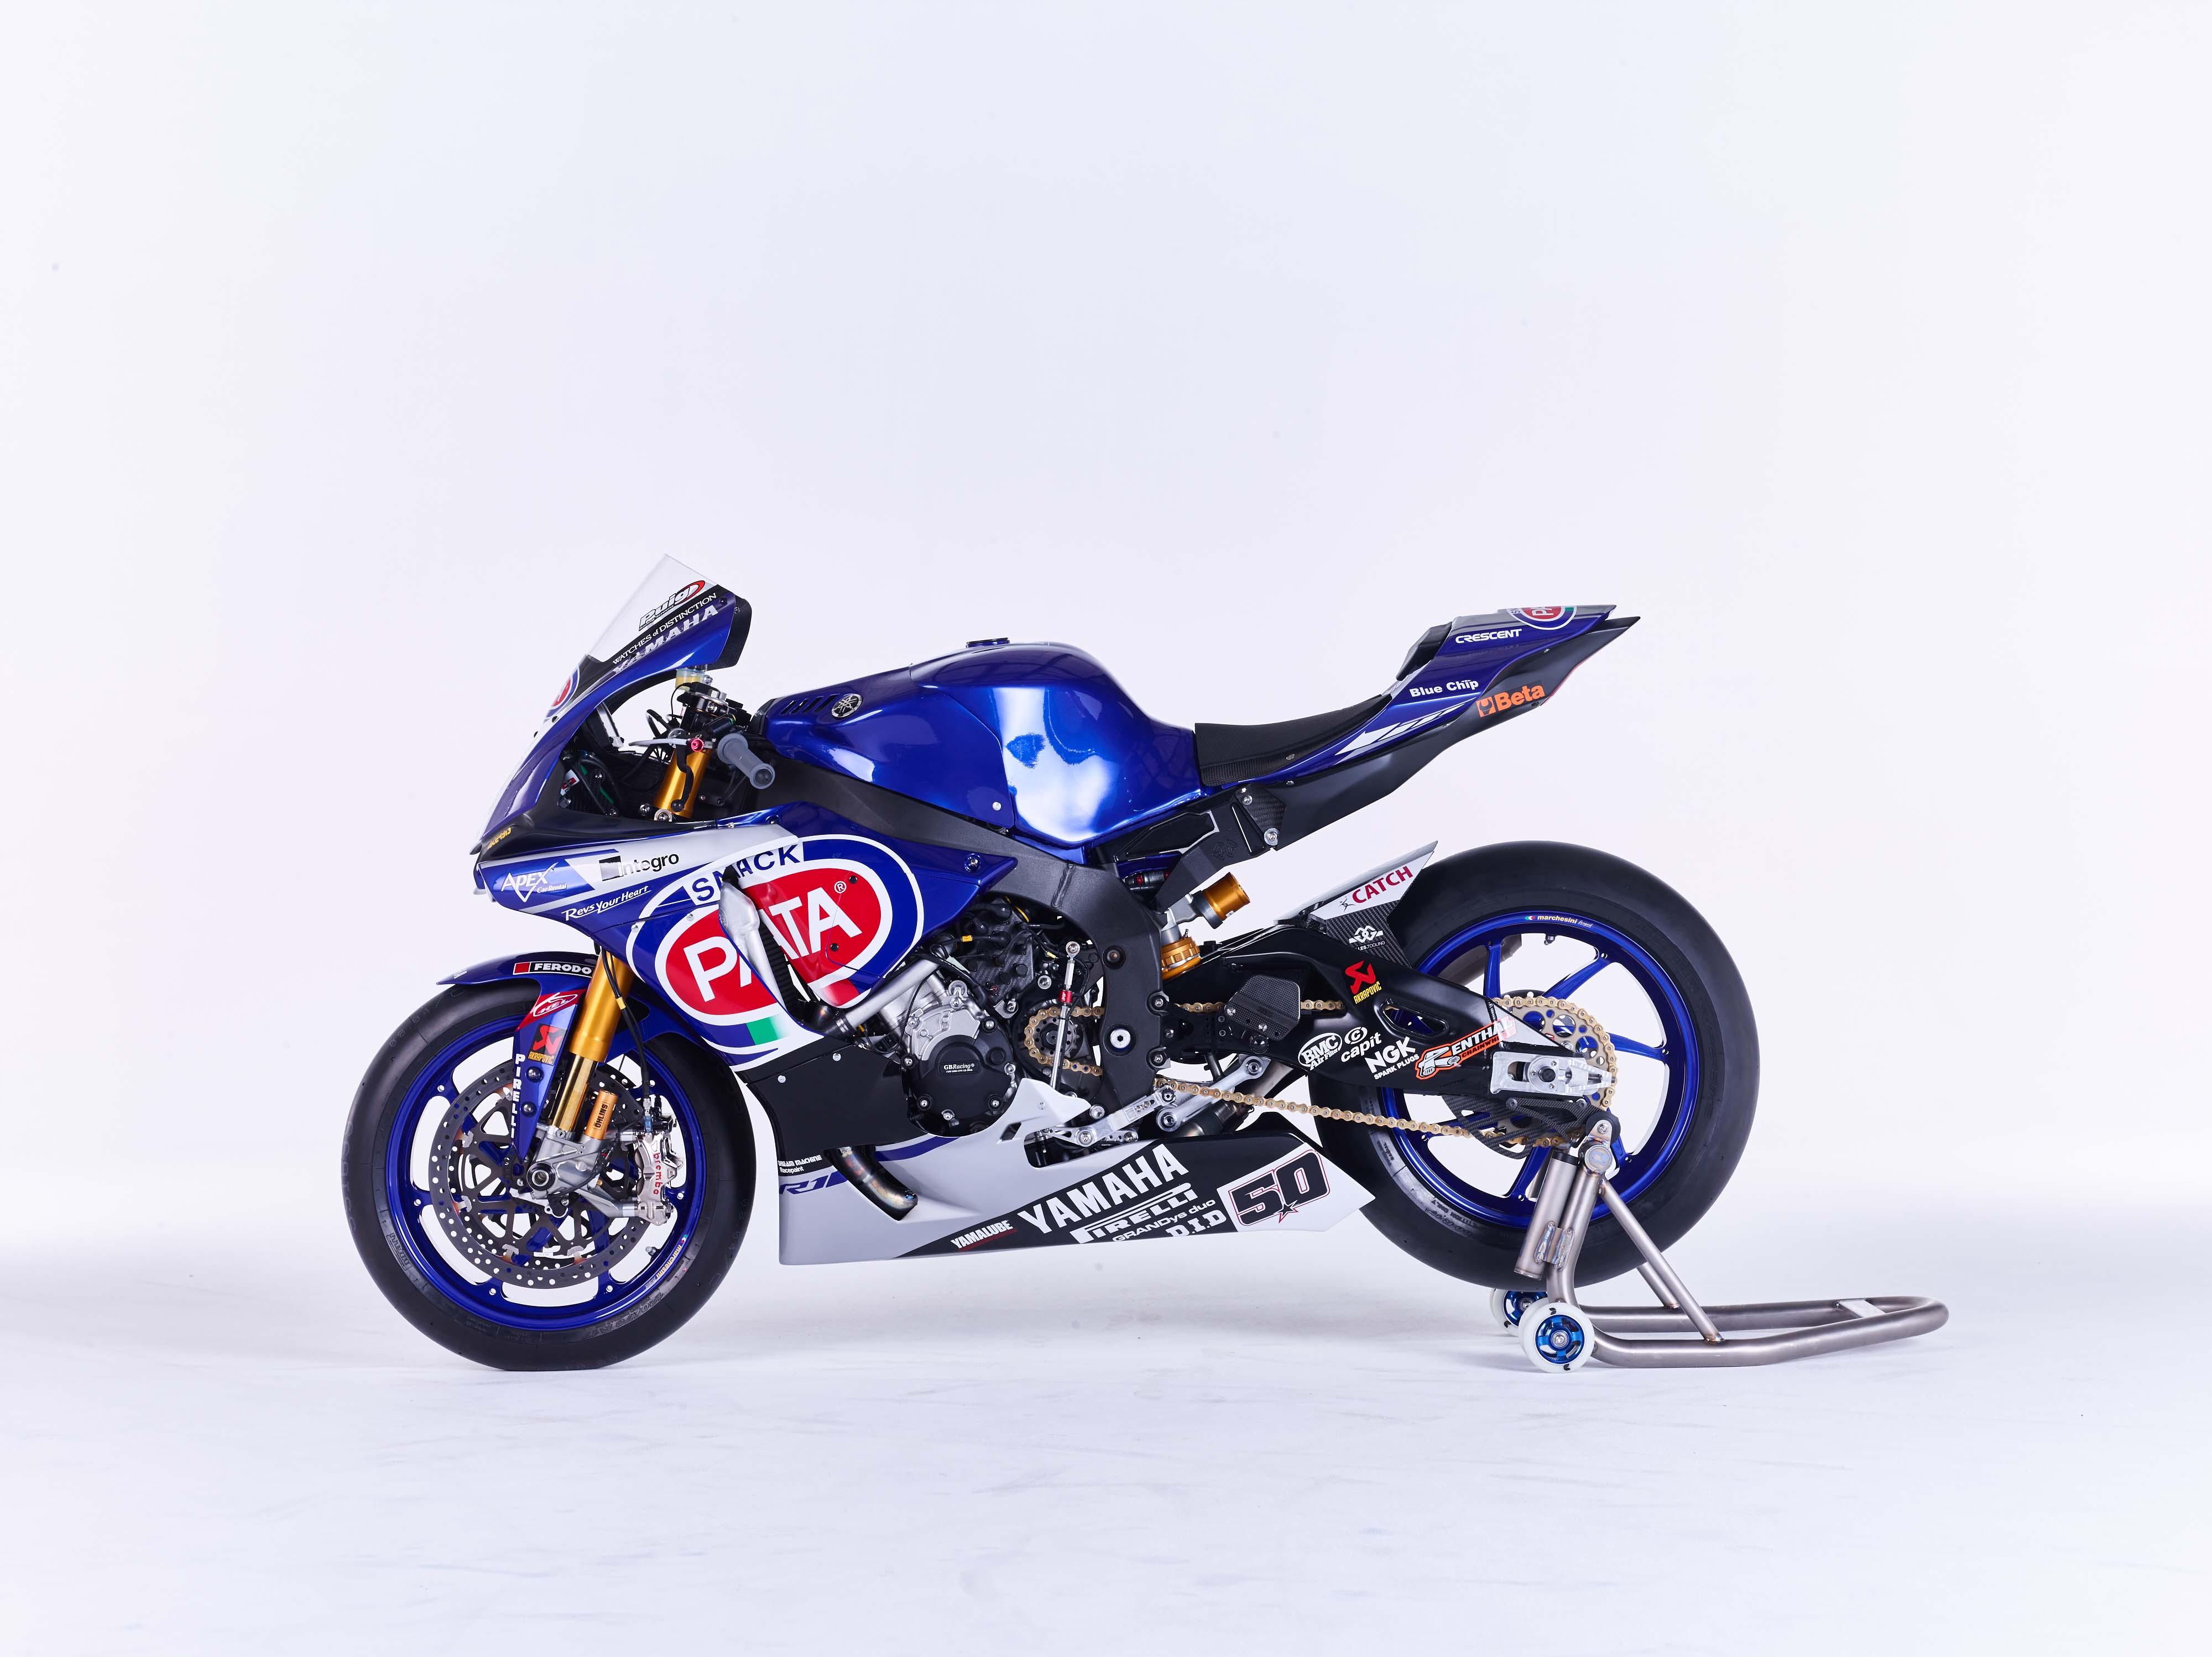 2016 yamaha yzf r1 world superbike 11 bikesrepublic for Yamaha r1 2016 price